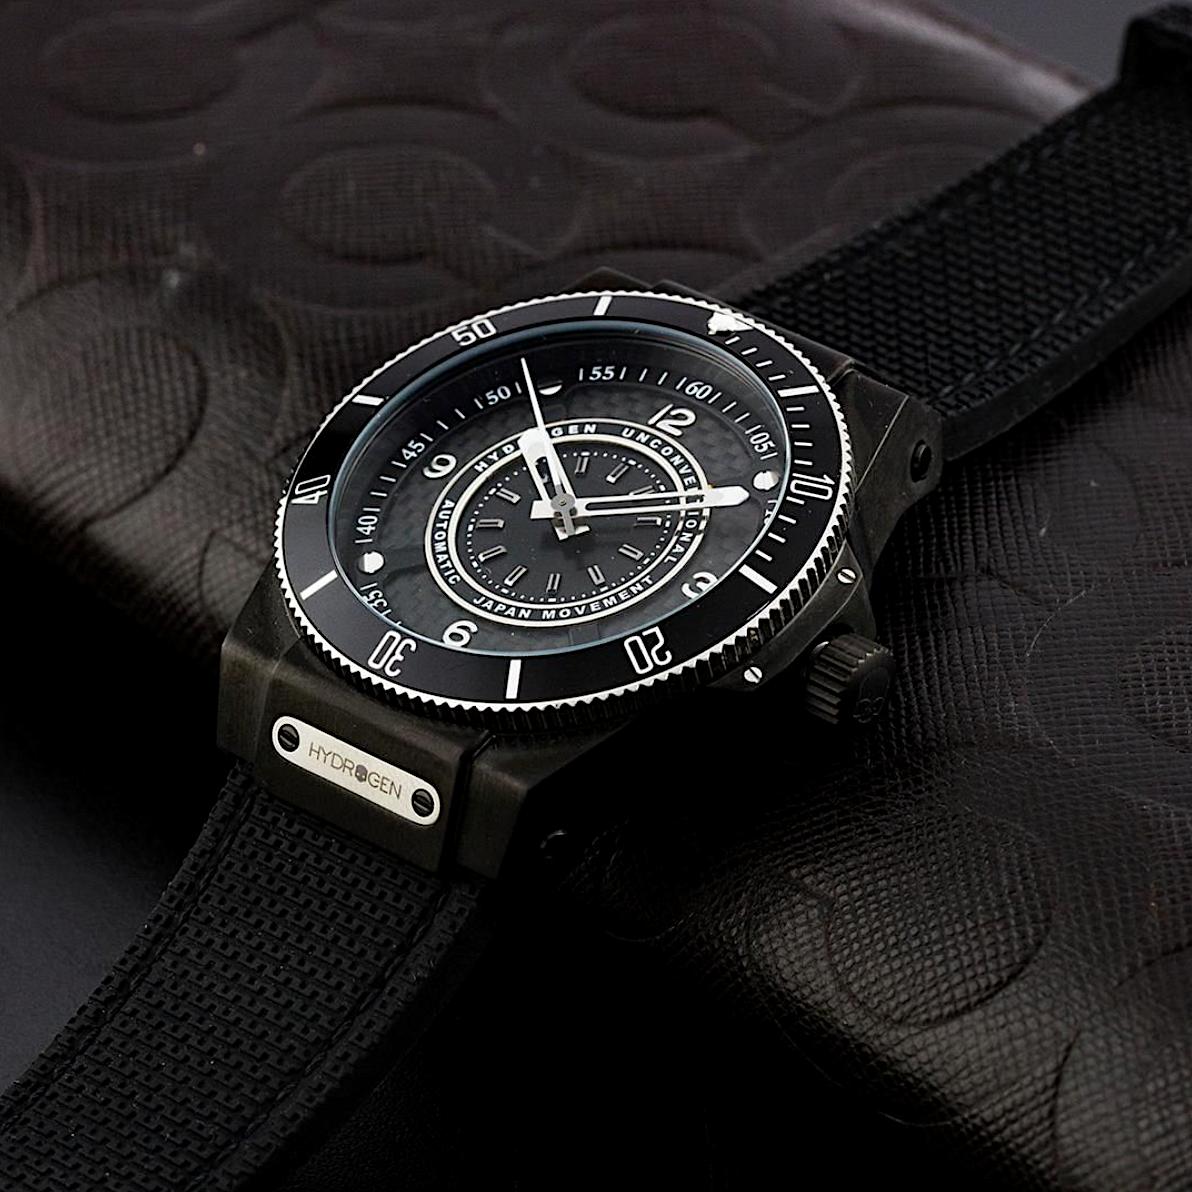 【HYDROGEN WATCH ハイドロゲンウォッチ】HW324202/SPORTIVO スポルティヴォ(ブラック)/国内正規品 腕時計